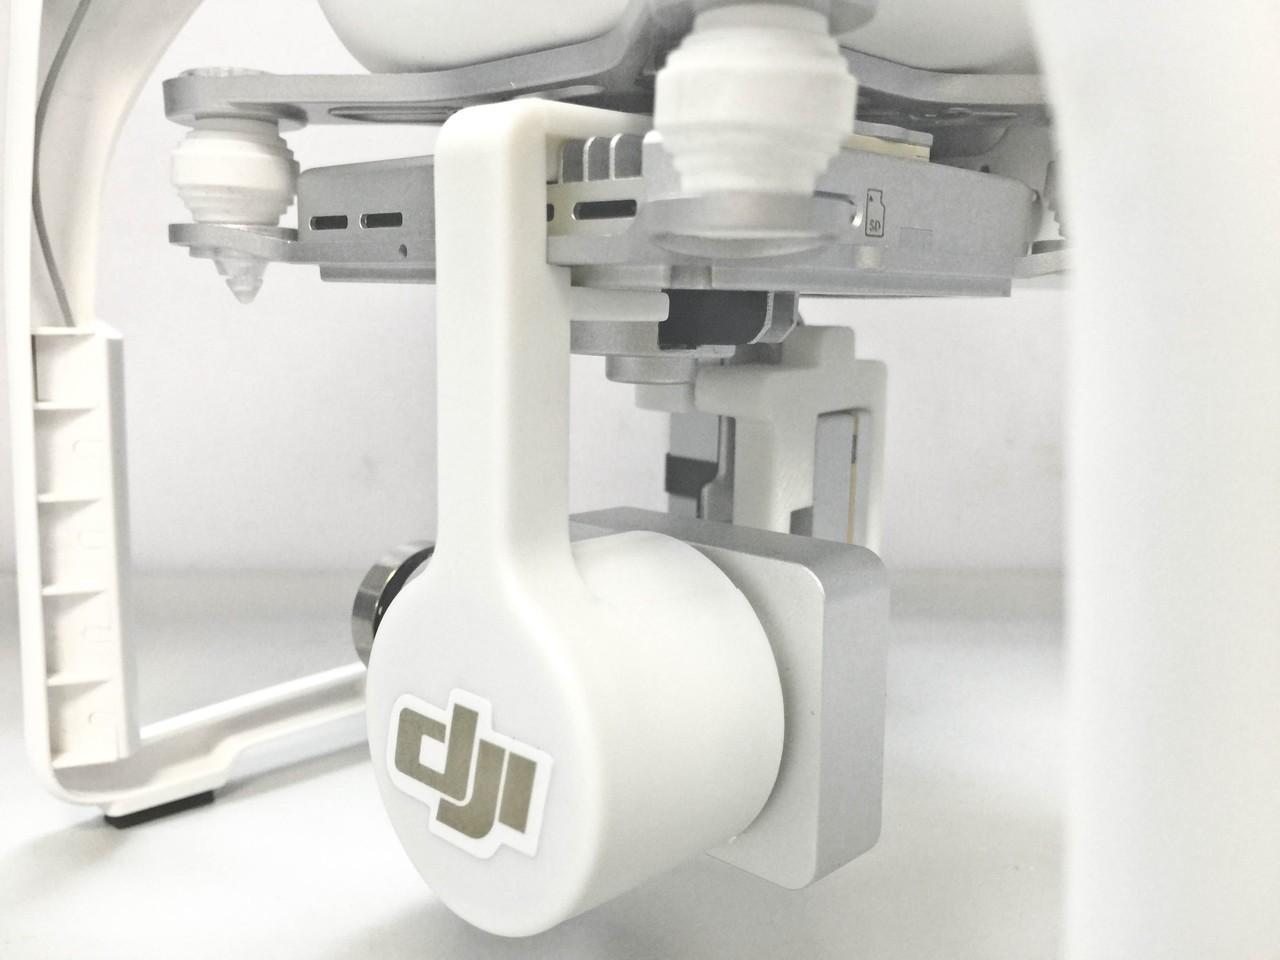 DJI Phantom 3 Lens Cap & Camera Protection